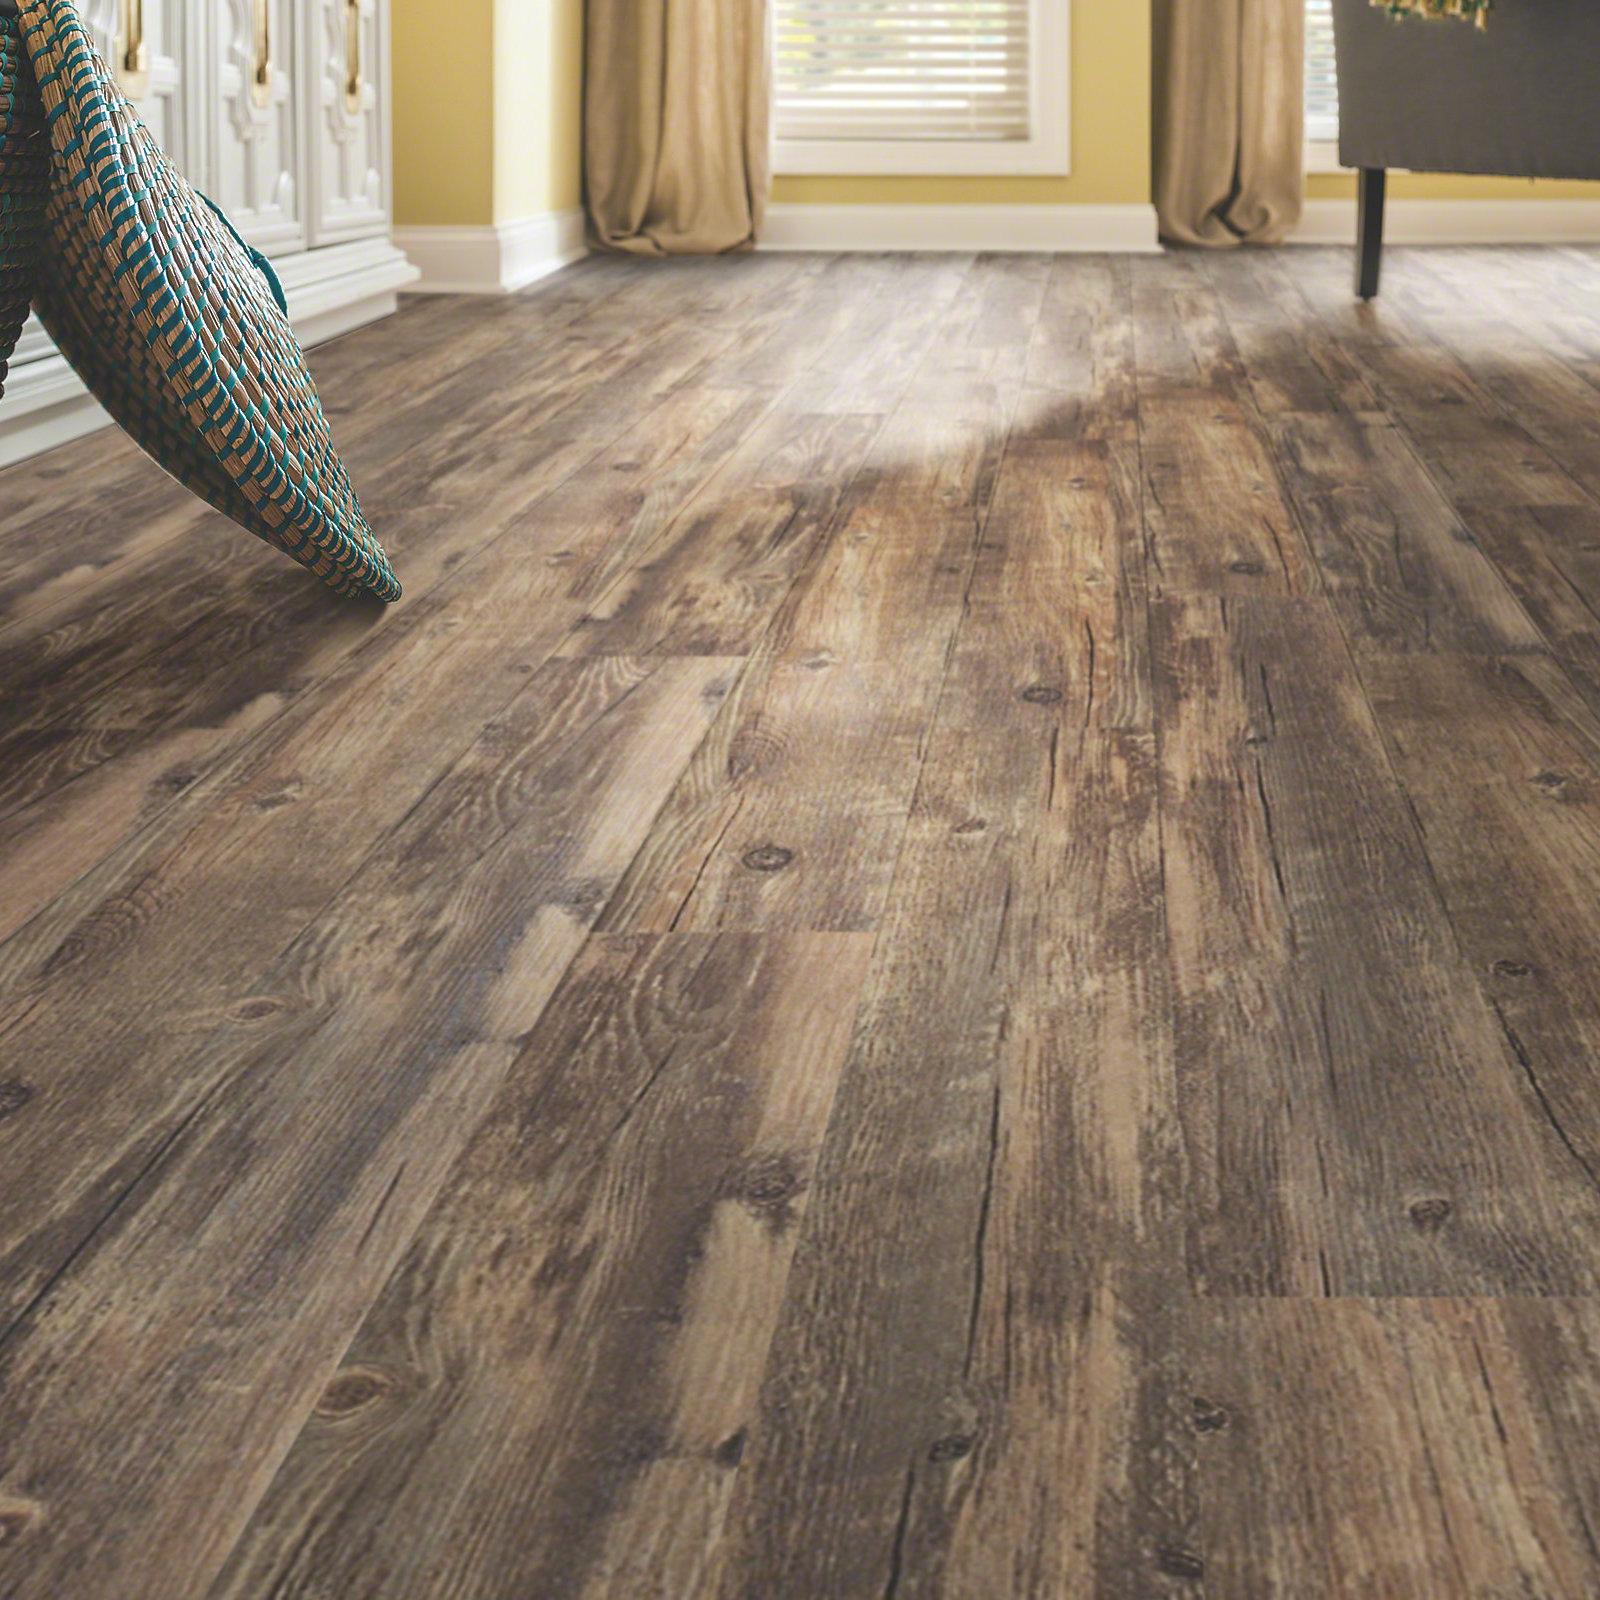 vinyl plank flooring shaw floors worldu0027s fair 12 6 EEQKORY